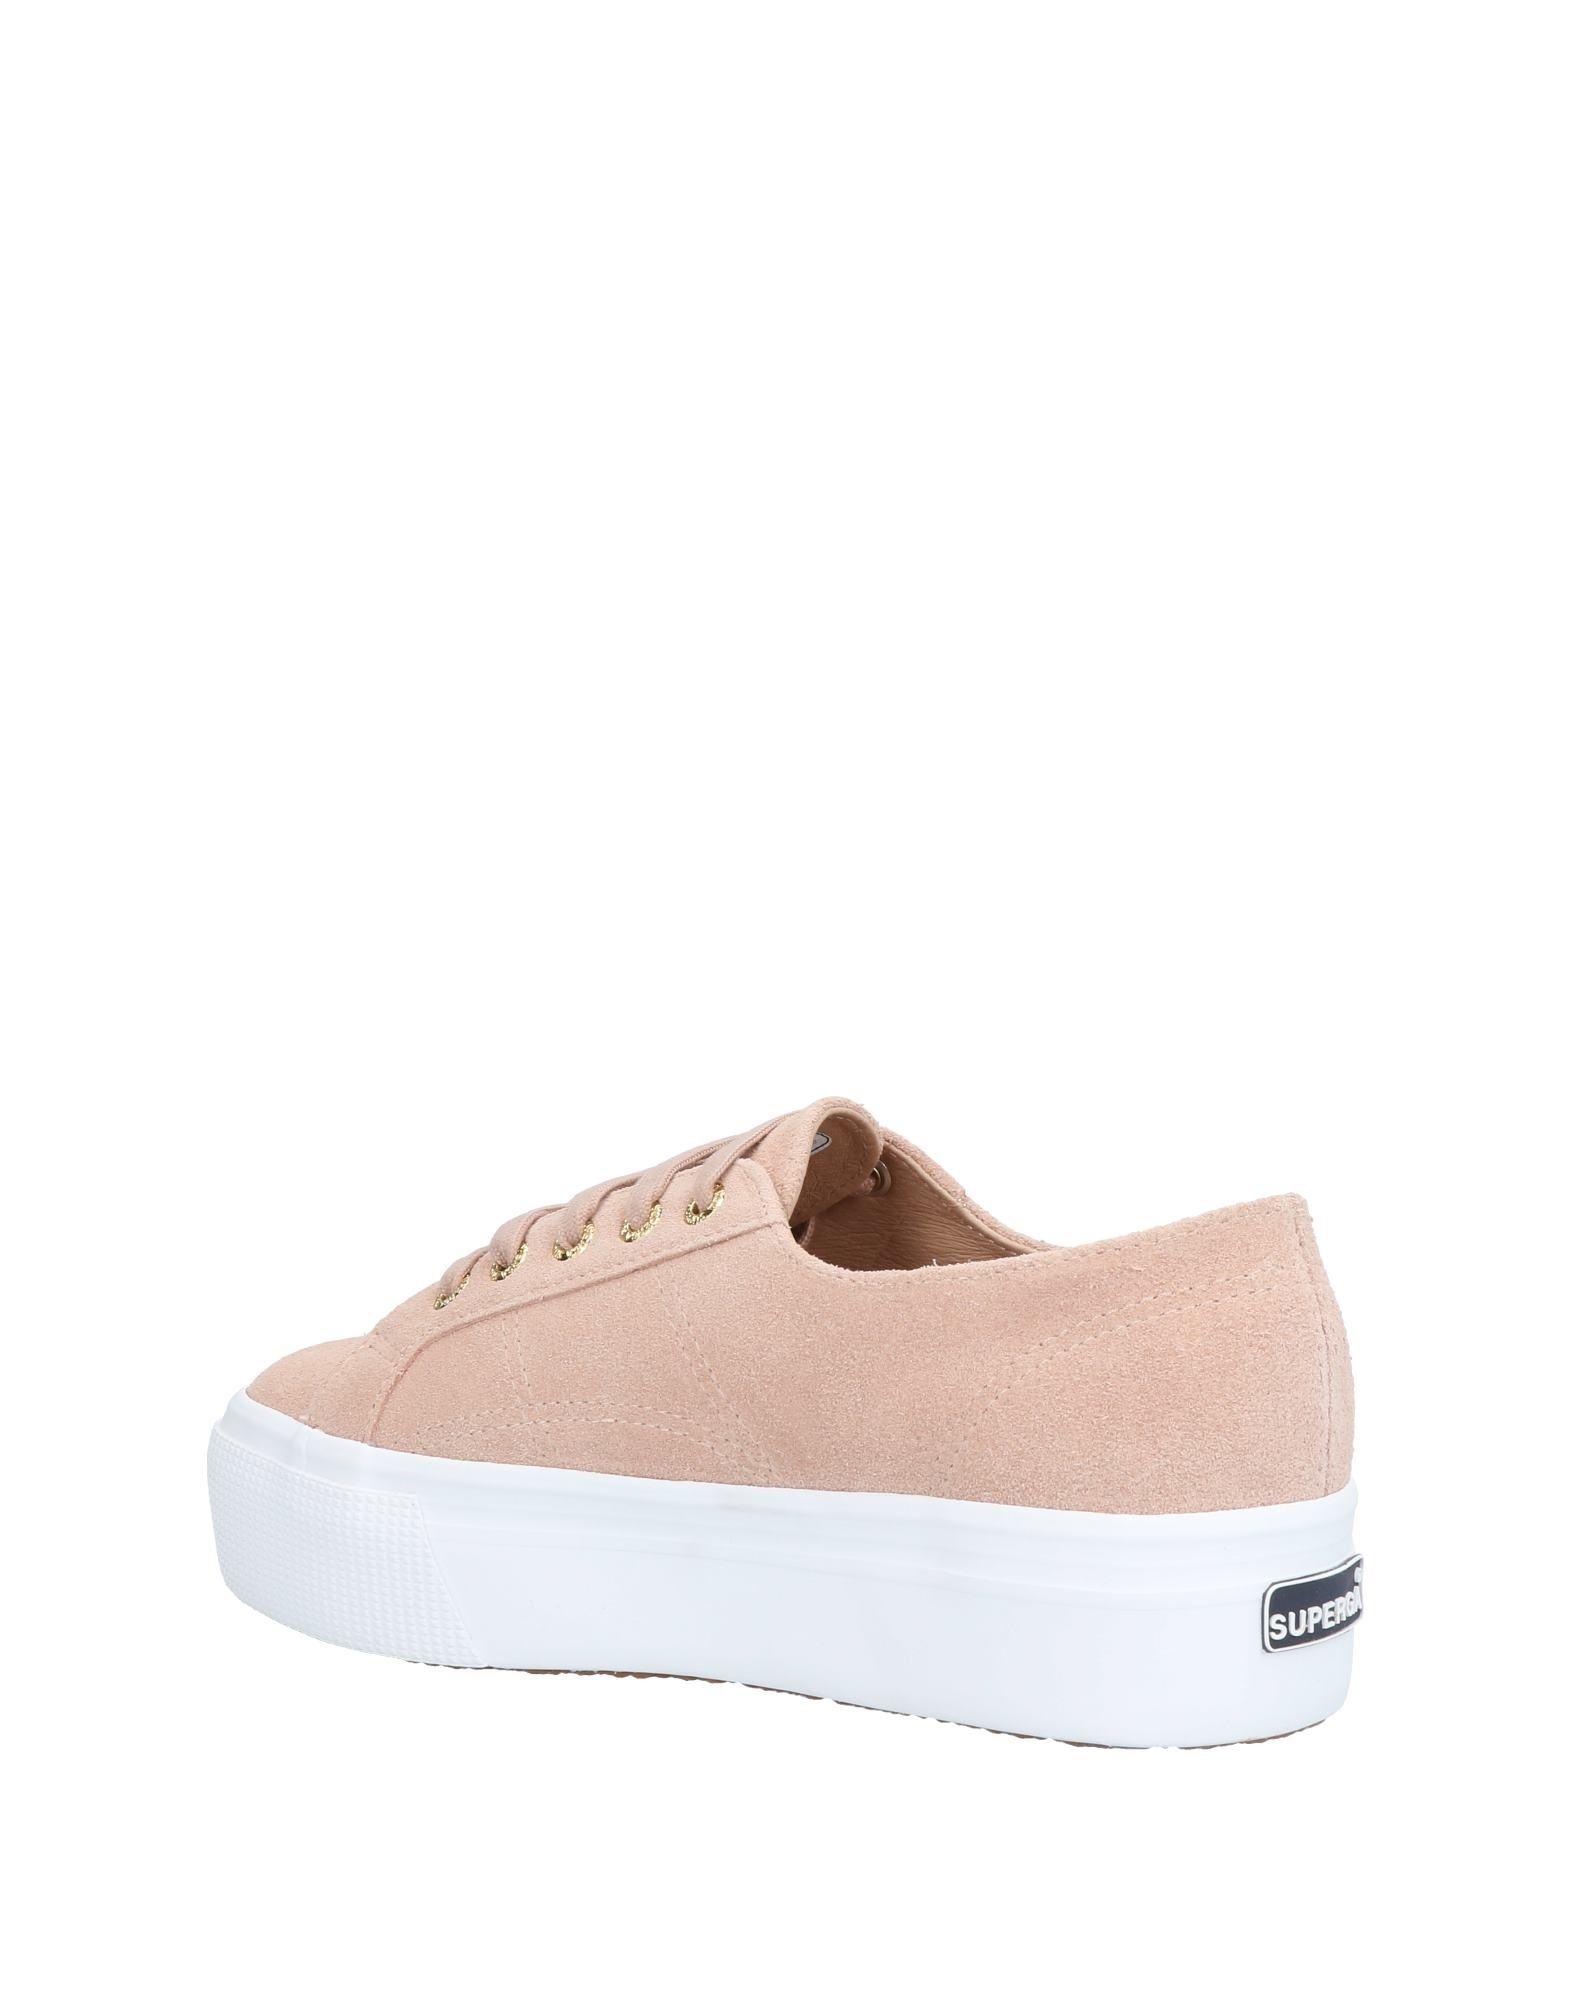 Superga® Sneakers Damen    11271410PX Heiße Schuhe 756602